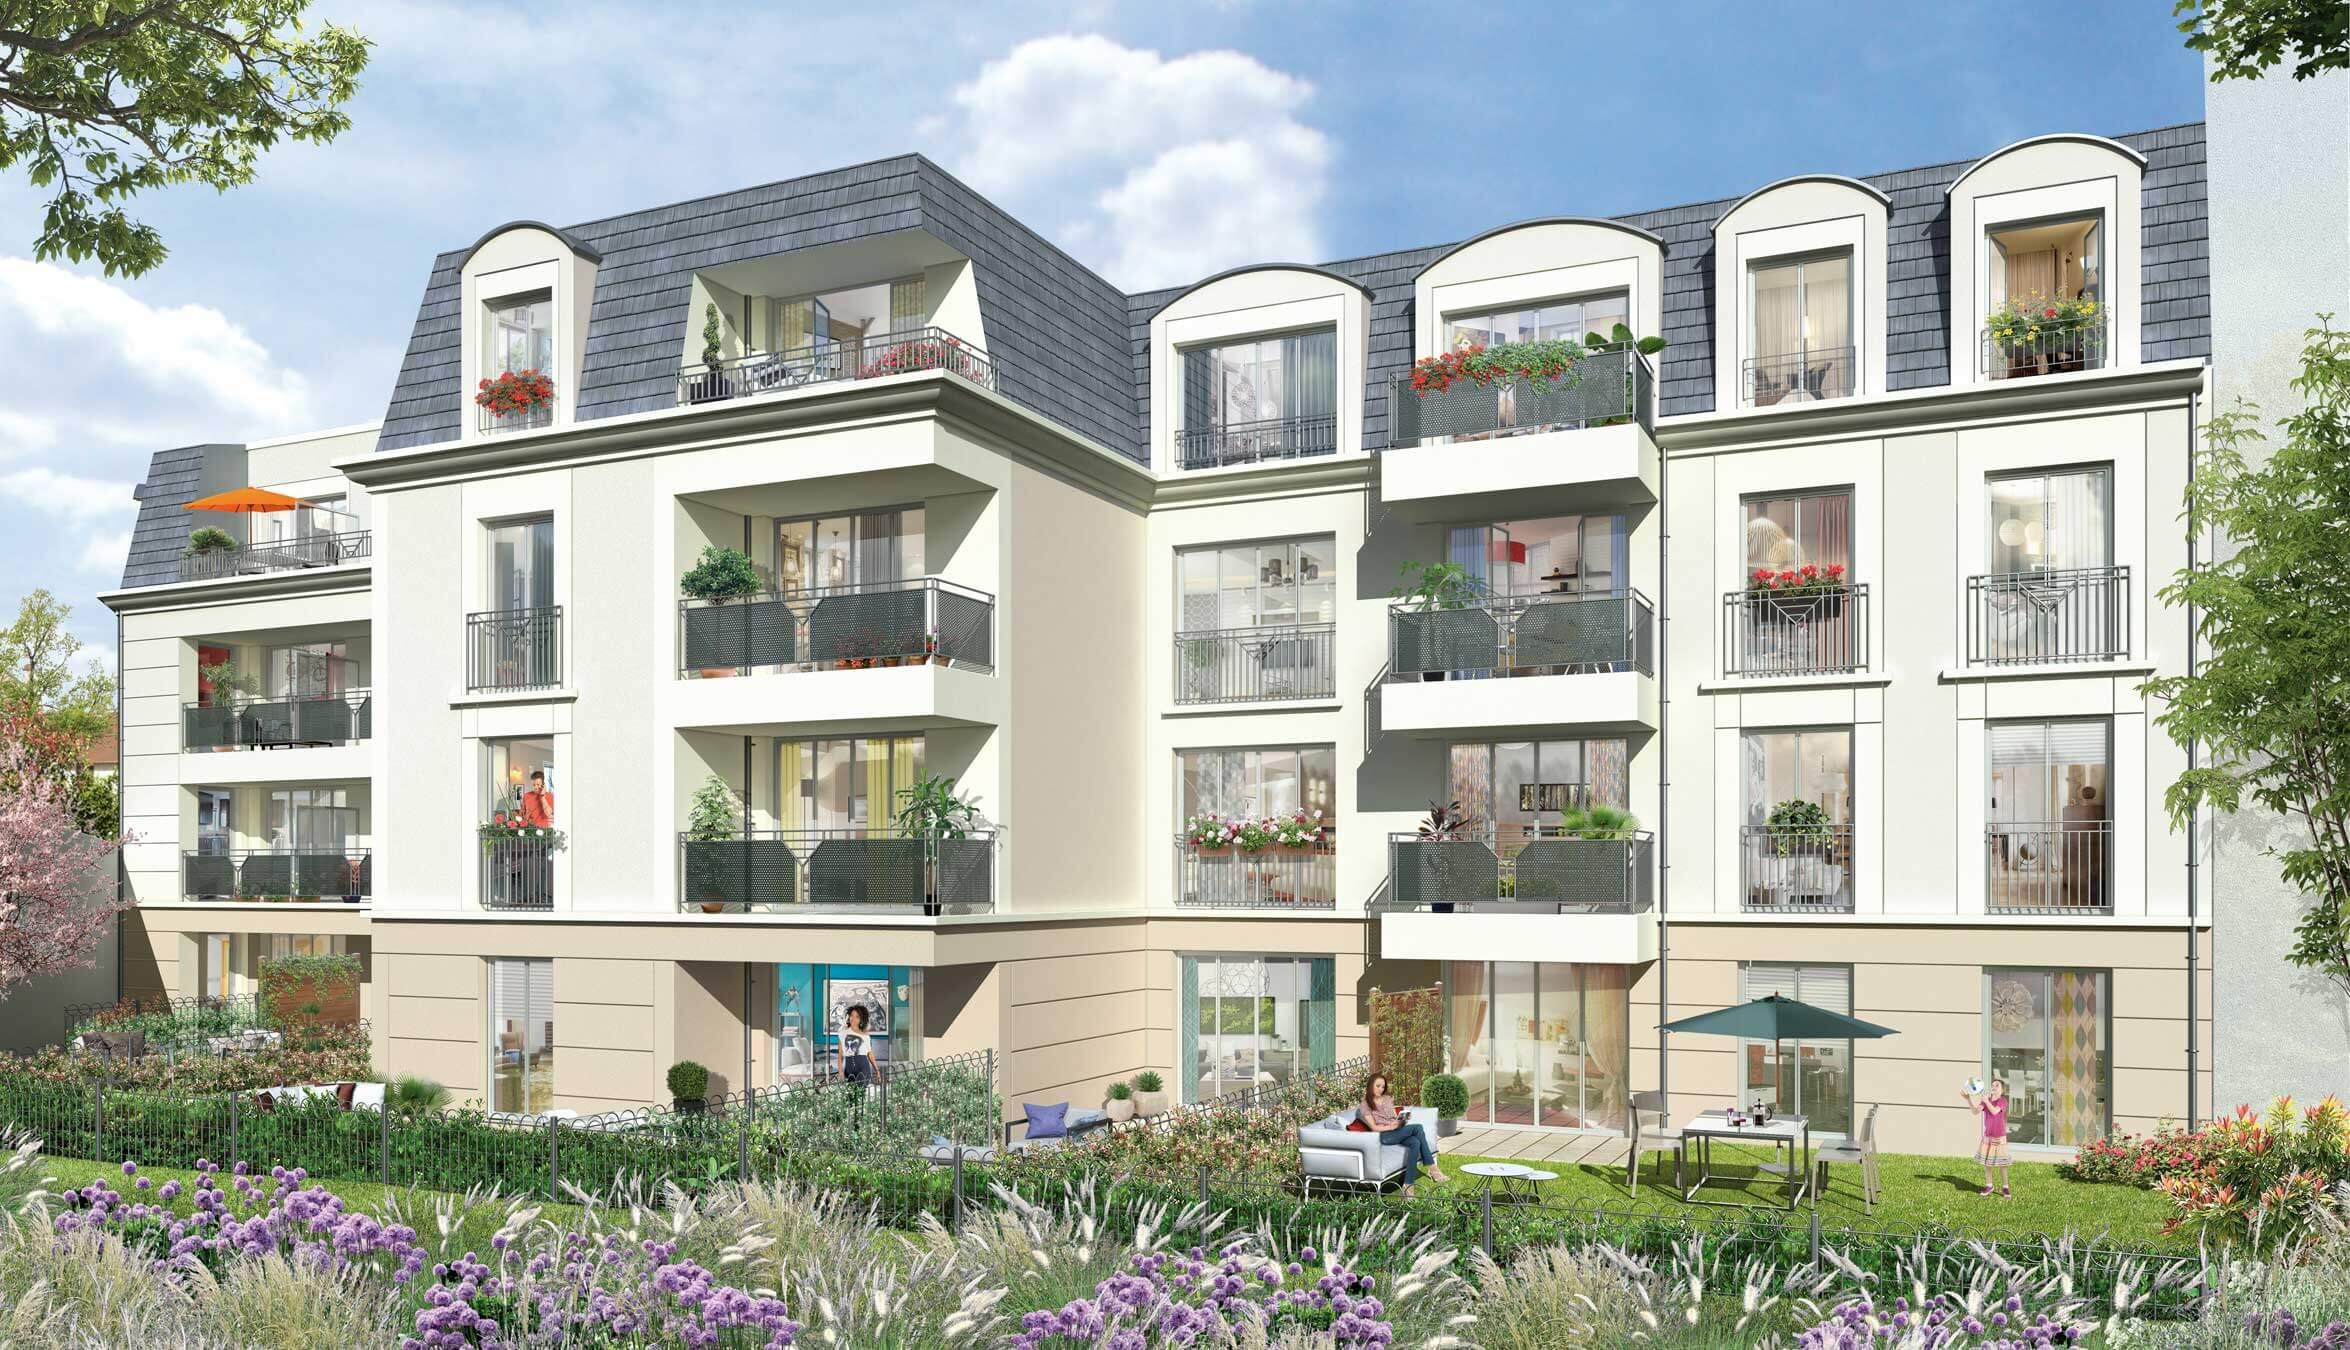 Le clos saint louis programme immobilier neuf saint for Immobilier neuf idf